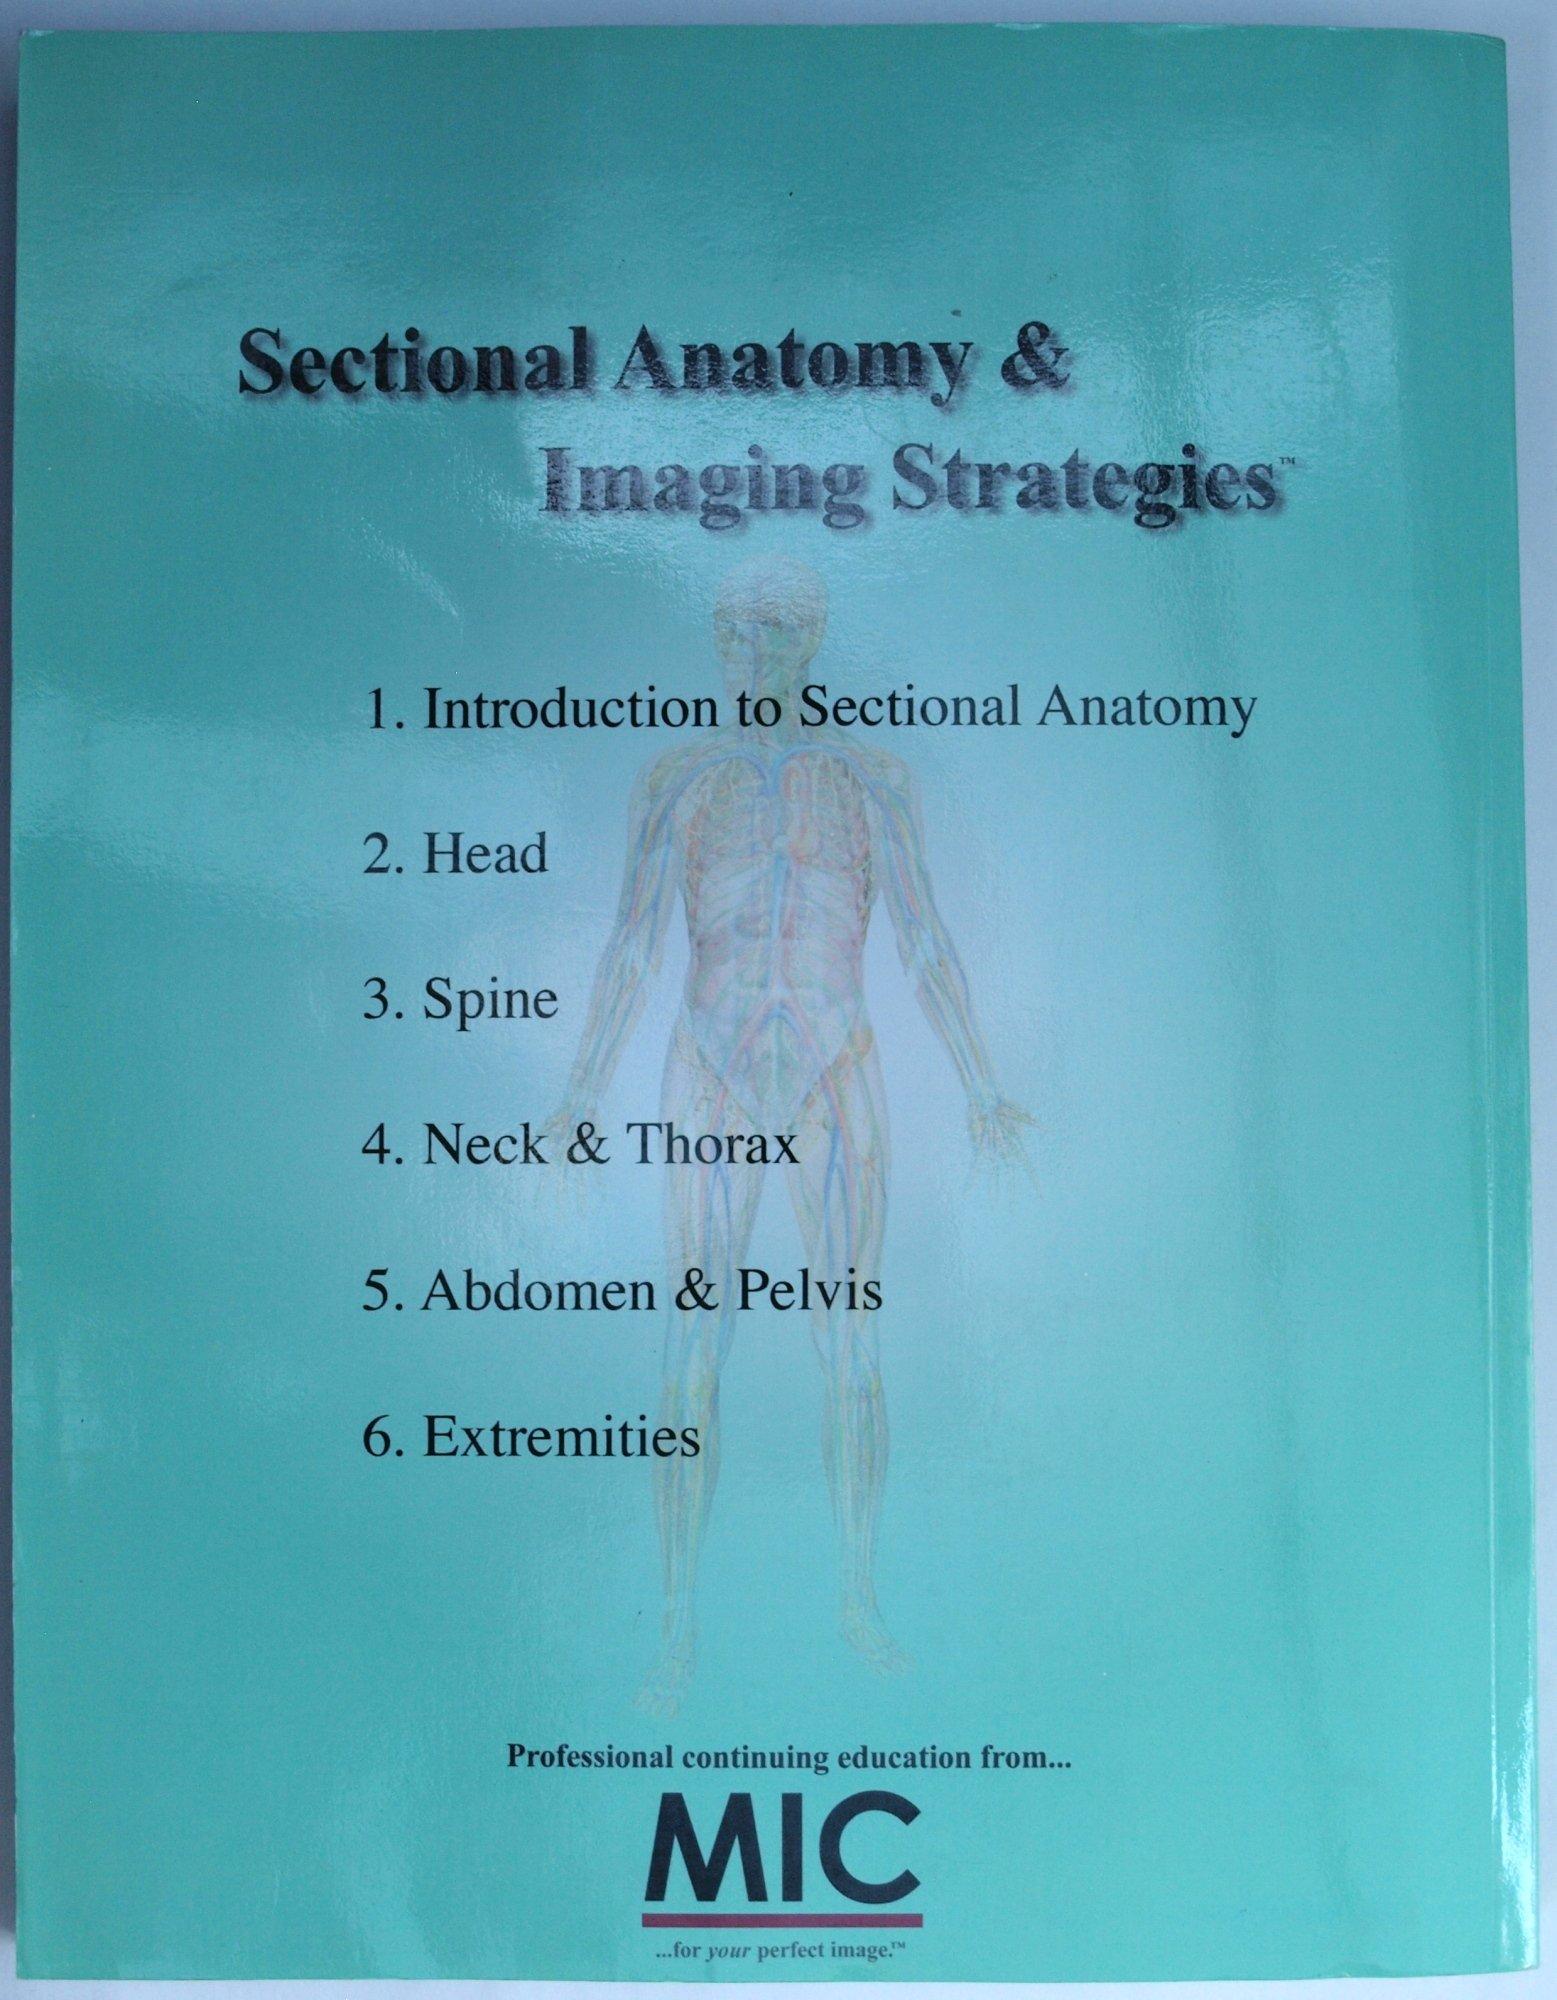 Sectional Anatomy & Imaging Strategies: MIC Inc.: Amazon.com: Books